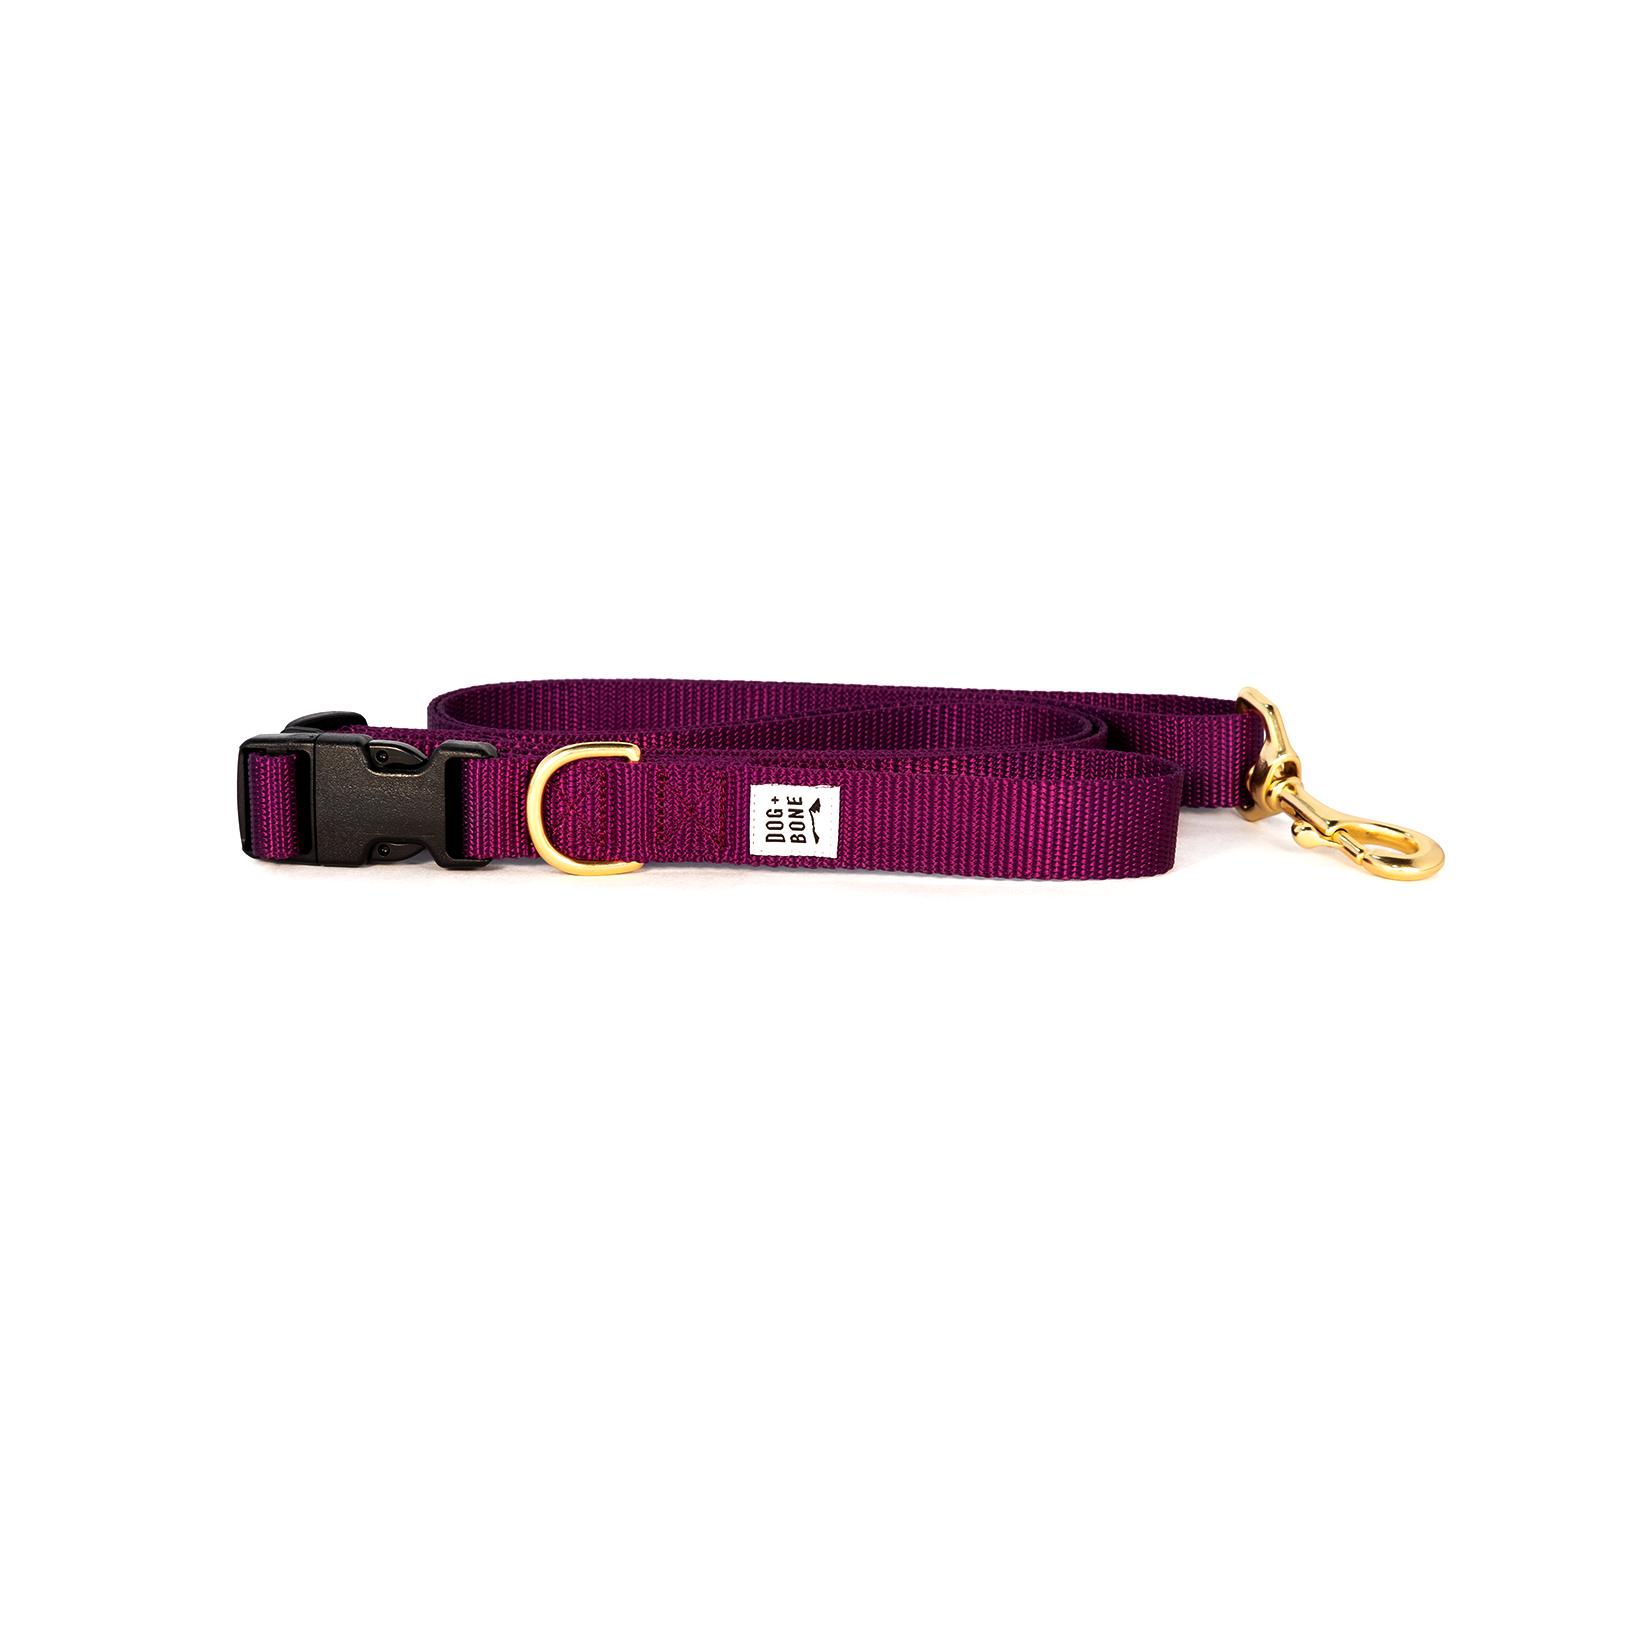 Leash_Adjustable_Purple_1_54e59648-0172-4af0-a0d6-97bef04e940b_2048x2048.png